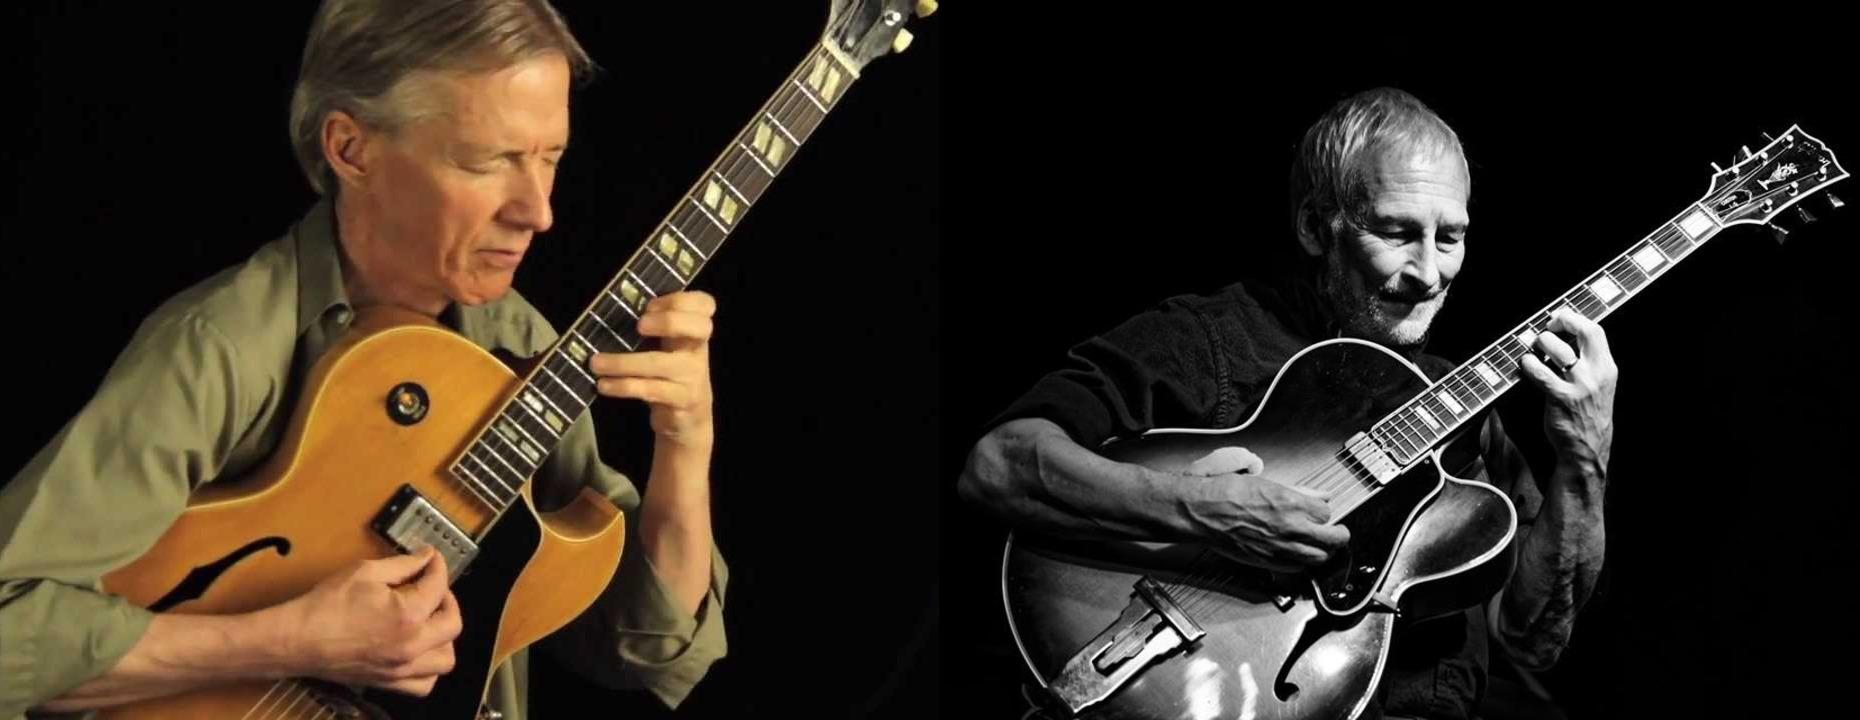 Guitarists Frank Kohl & John Stowell